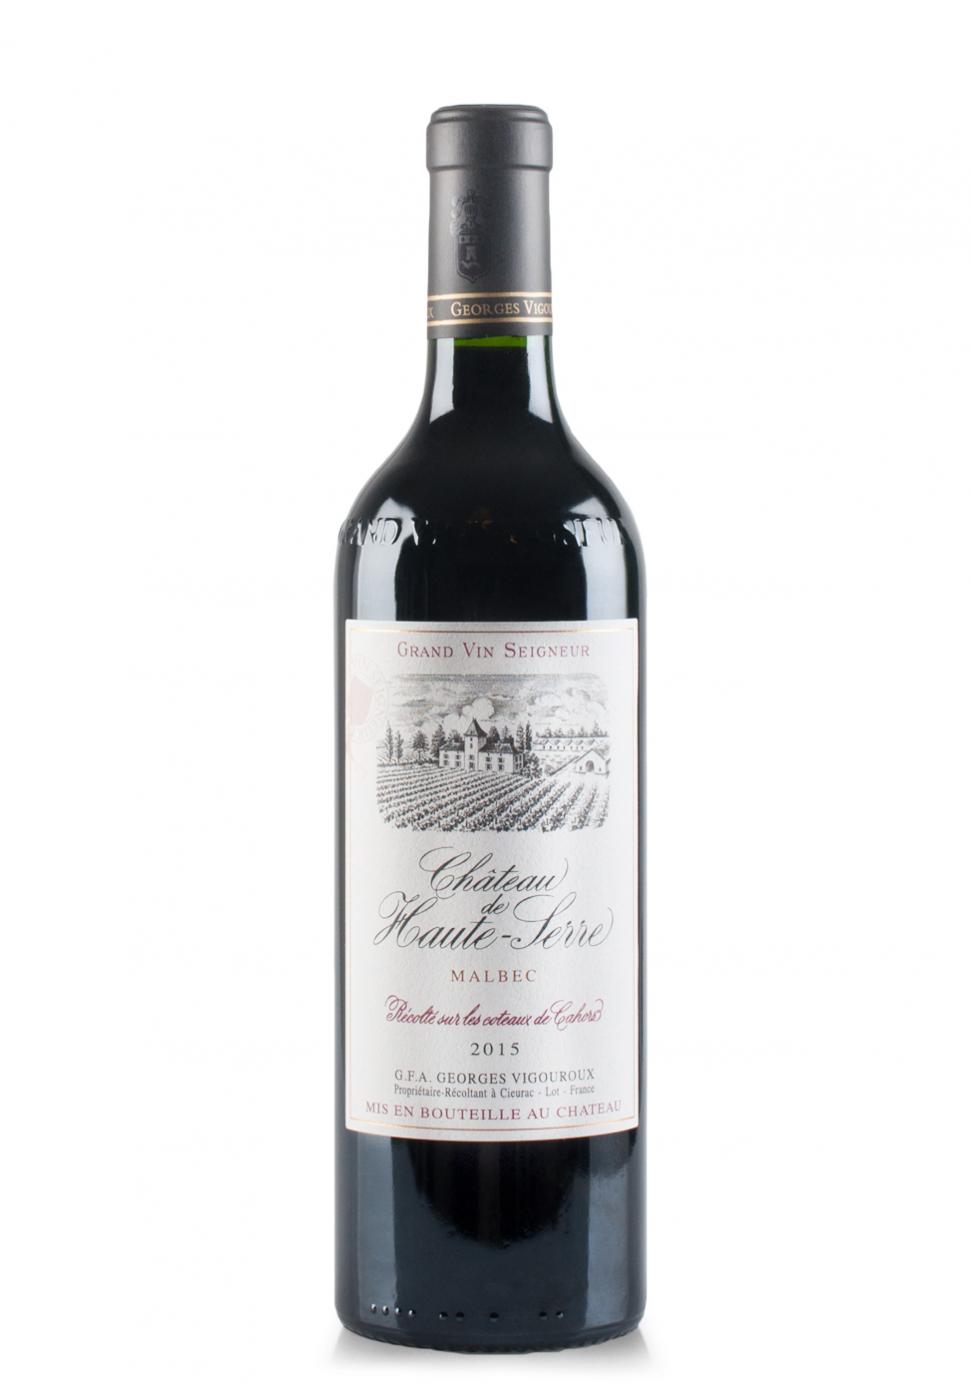 Vin Chateau de Haute-Serre, A.O.C. Cahors 2015 (0.75L)